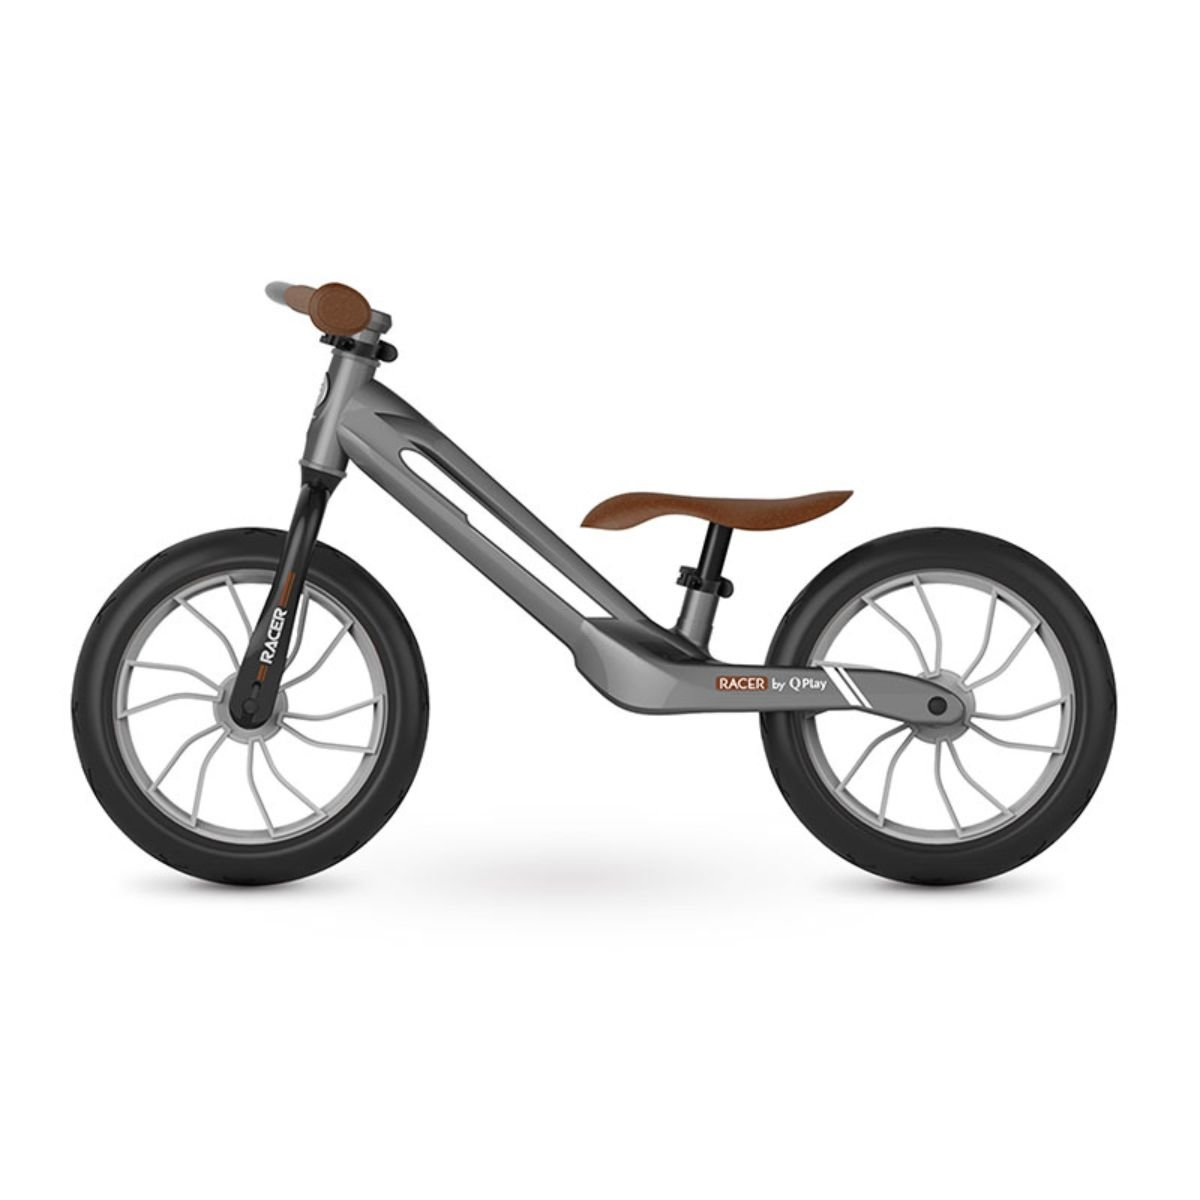 Bicicleta fara pedale DHS Baby Qplay Racer, Gri,12 inch